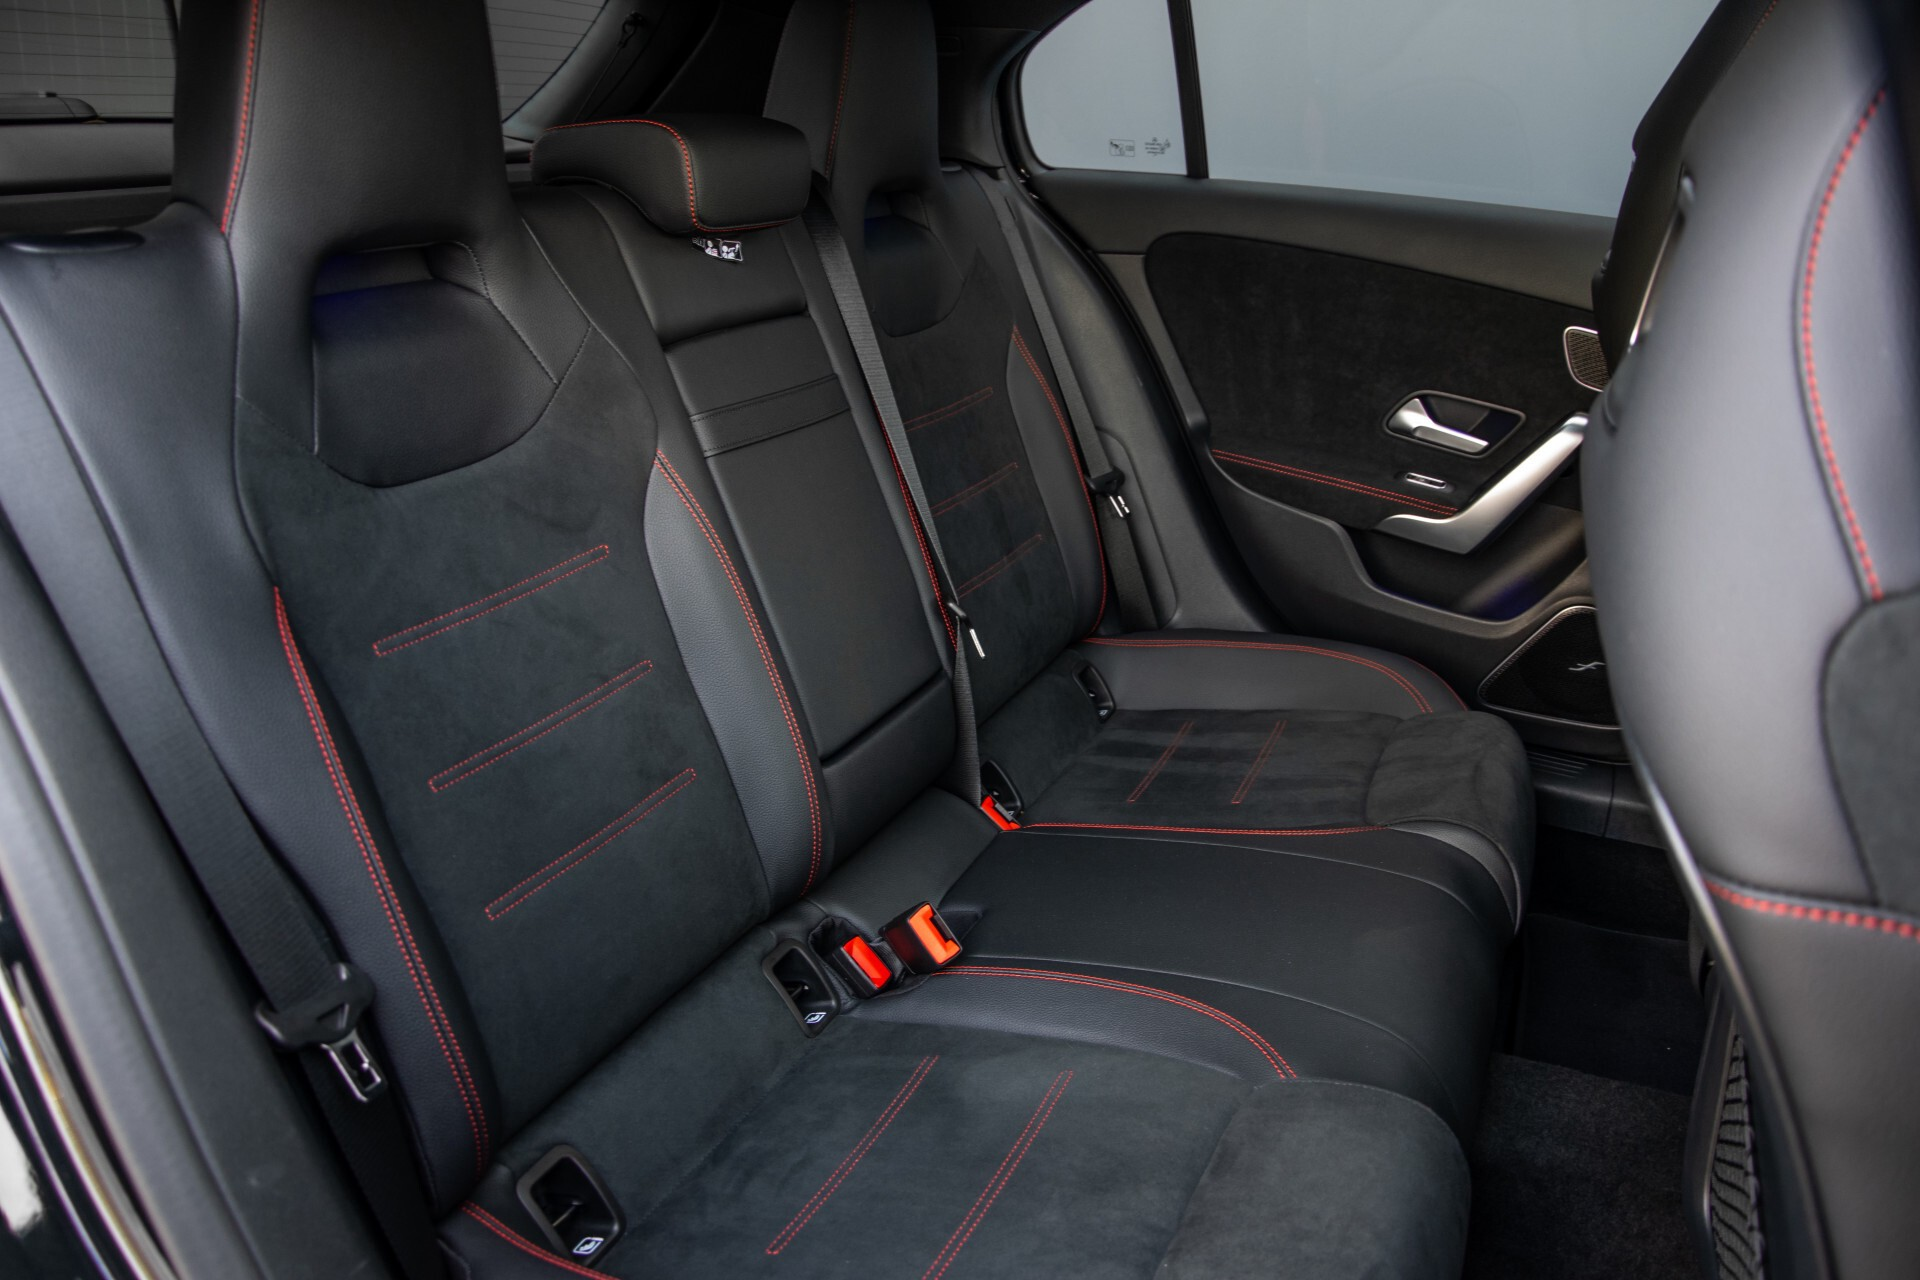 Mercedes-Benz A-Klasse 250 4-M AMG Panorama/Keyless-Entry/MBUX/HUD/Burmester/360/Multibeam LED Aut7 Foto 4